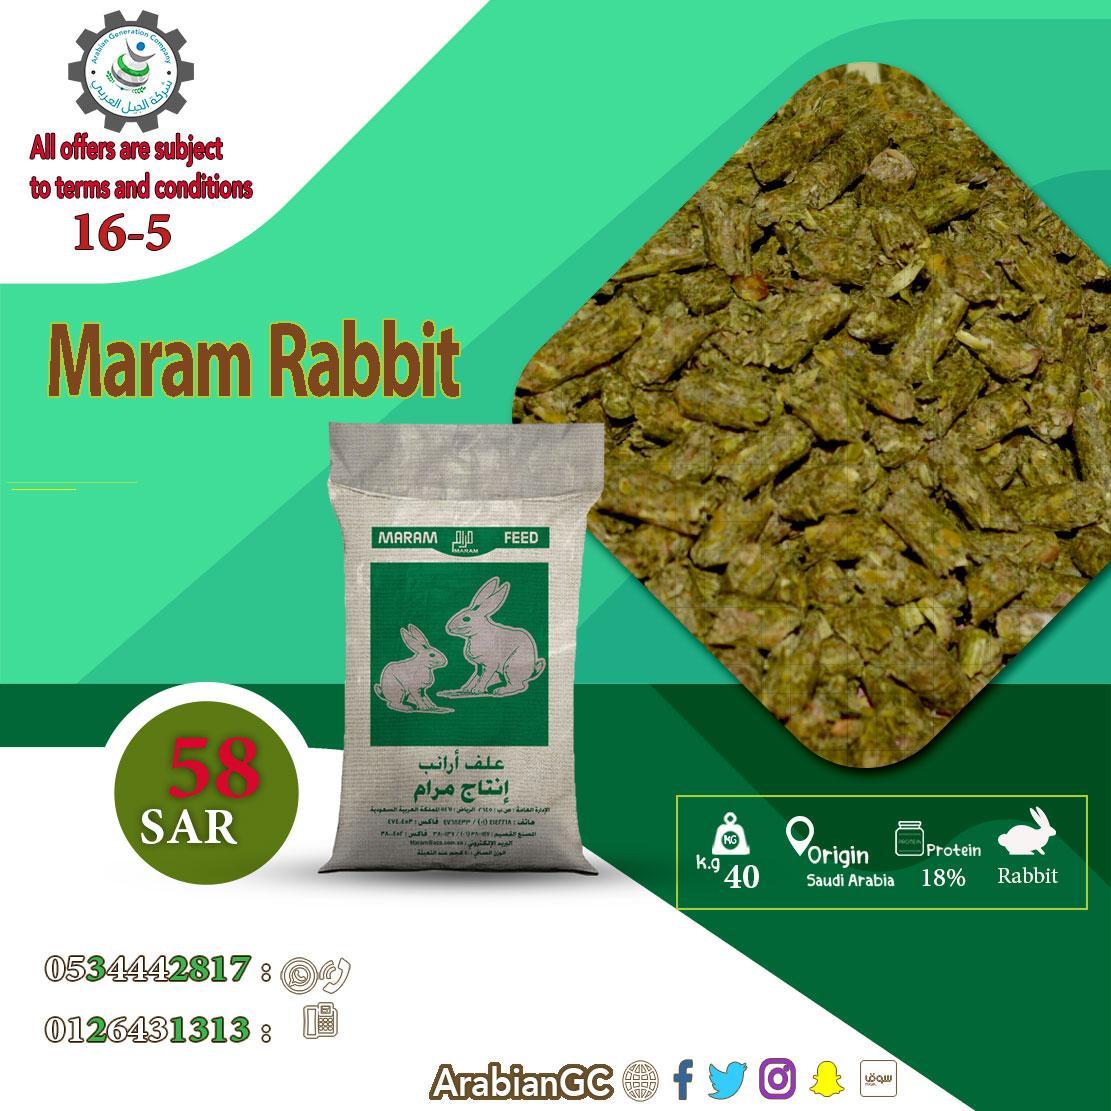 Maram rabbits feed d.php?hash=1J5Y44GT2